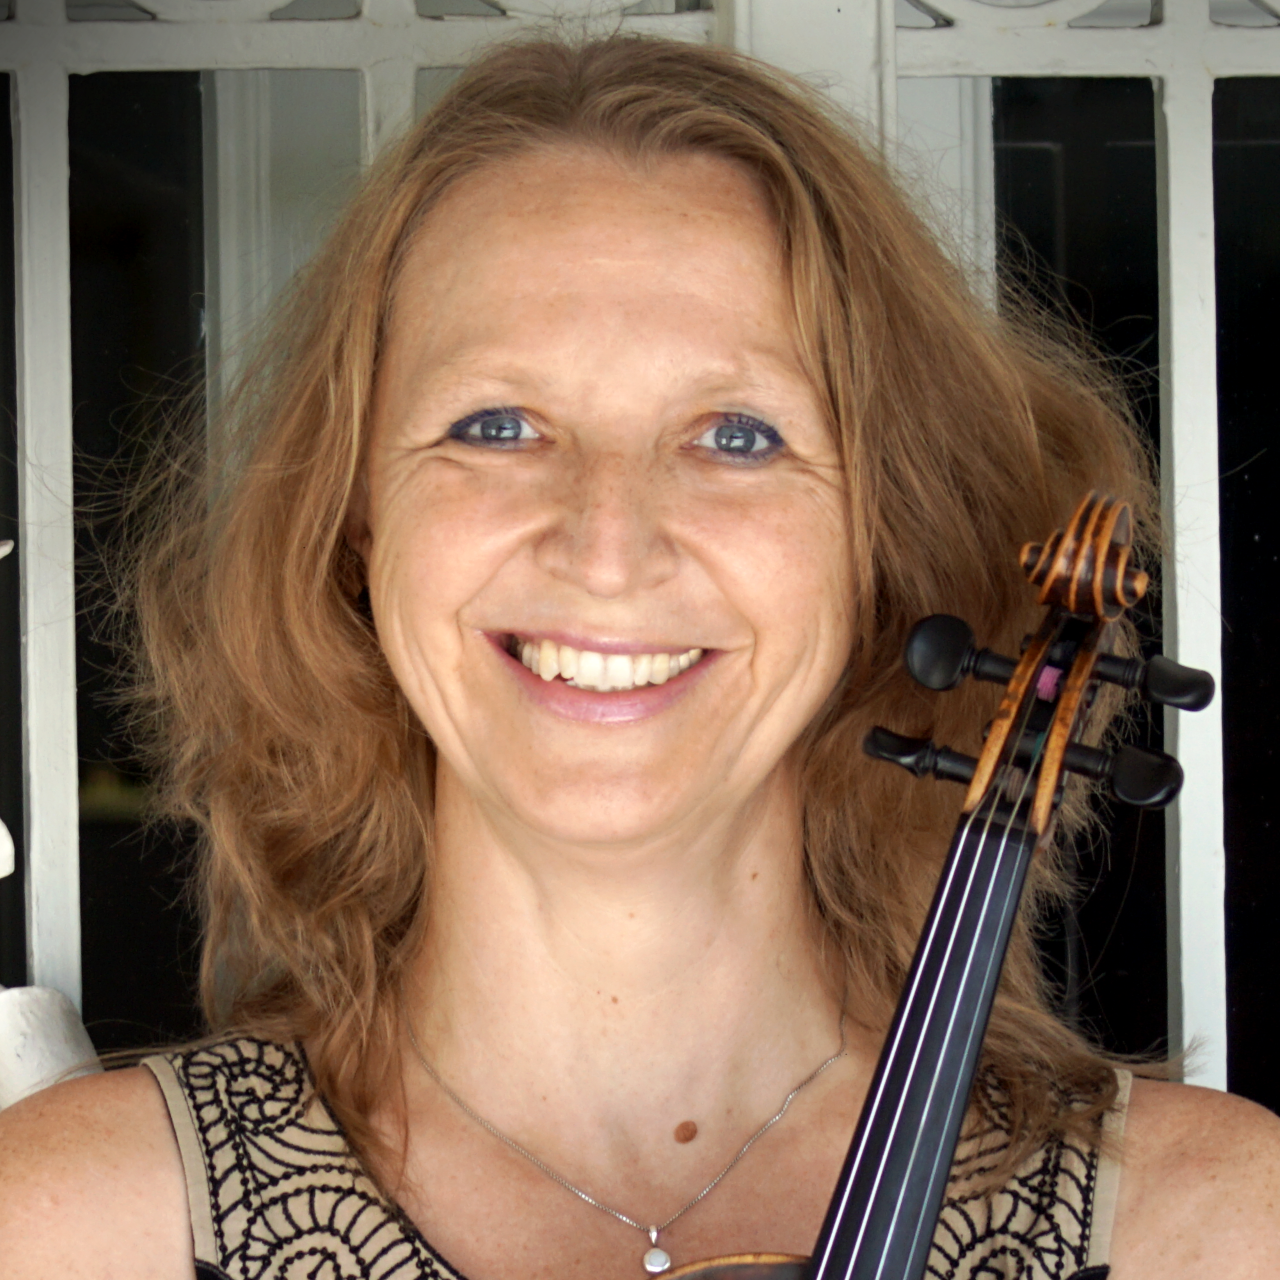 Vanessa Hager